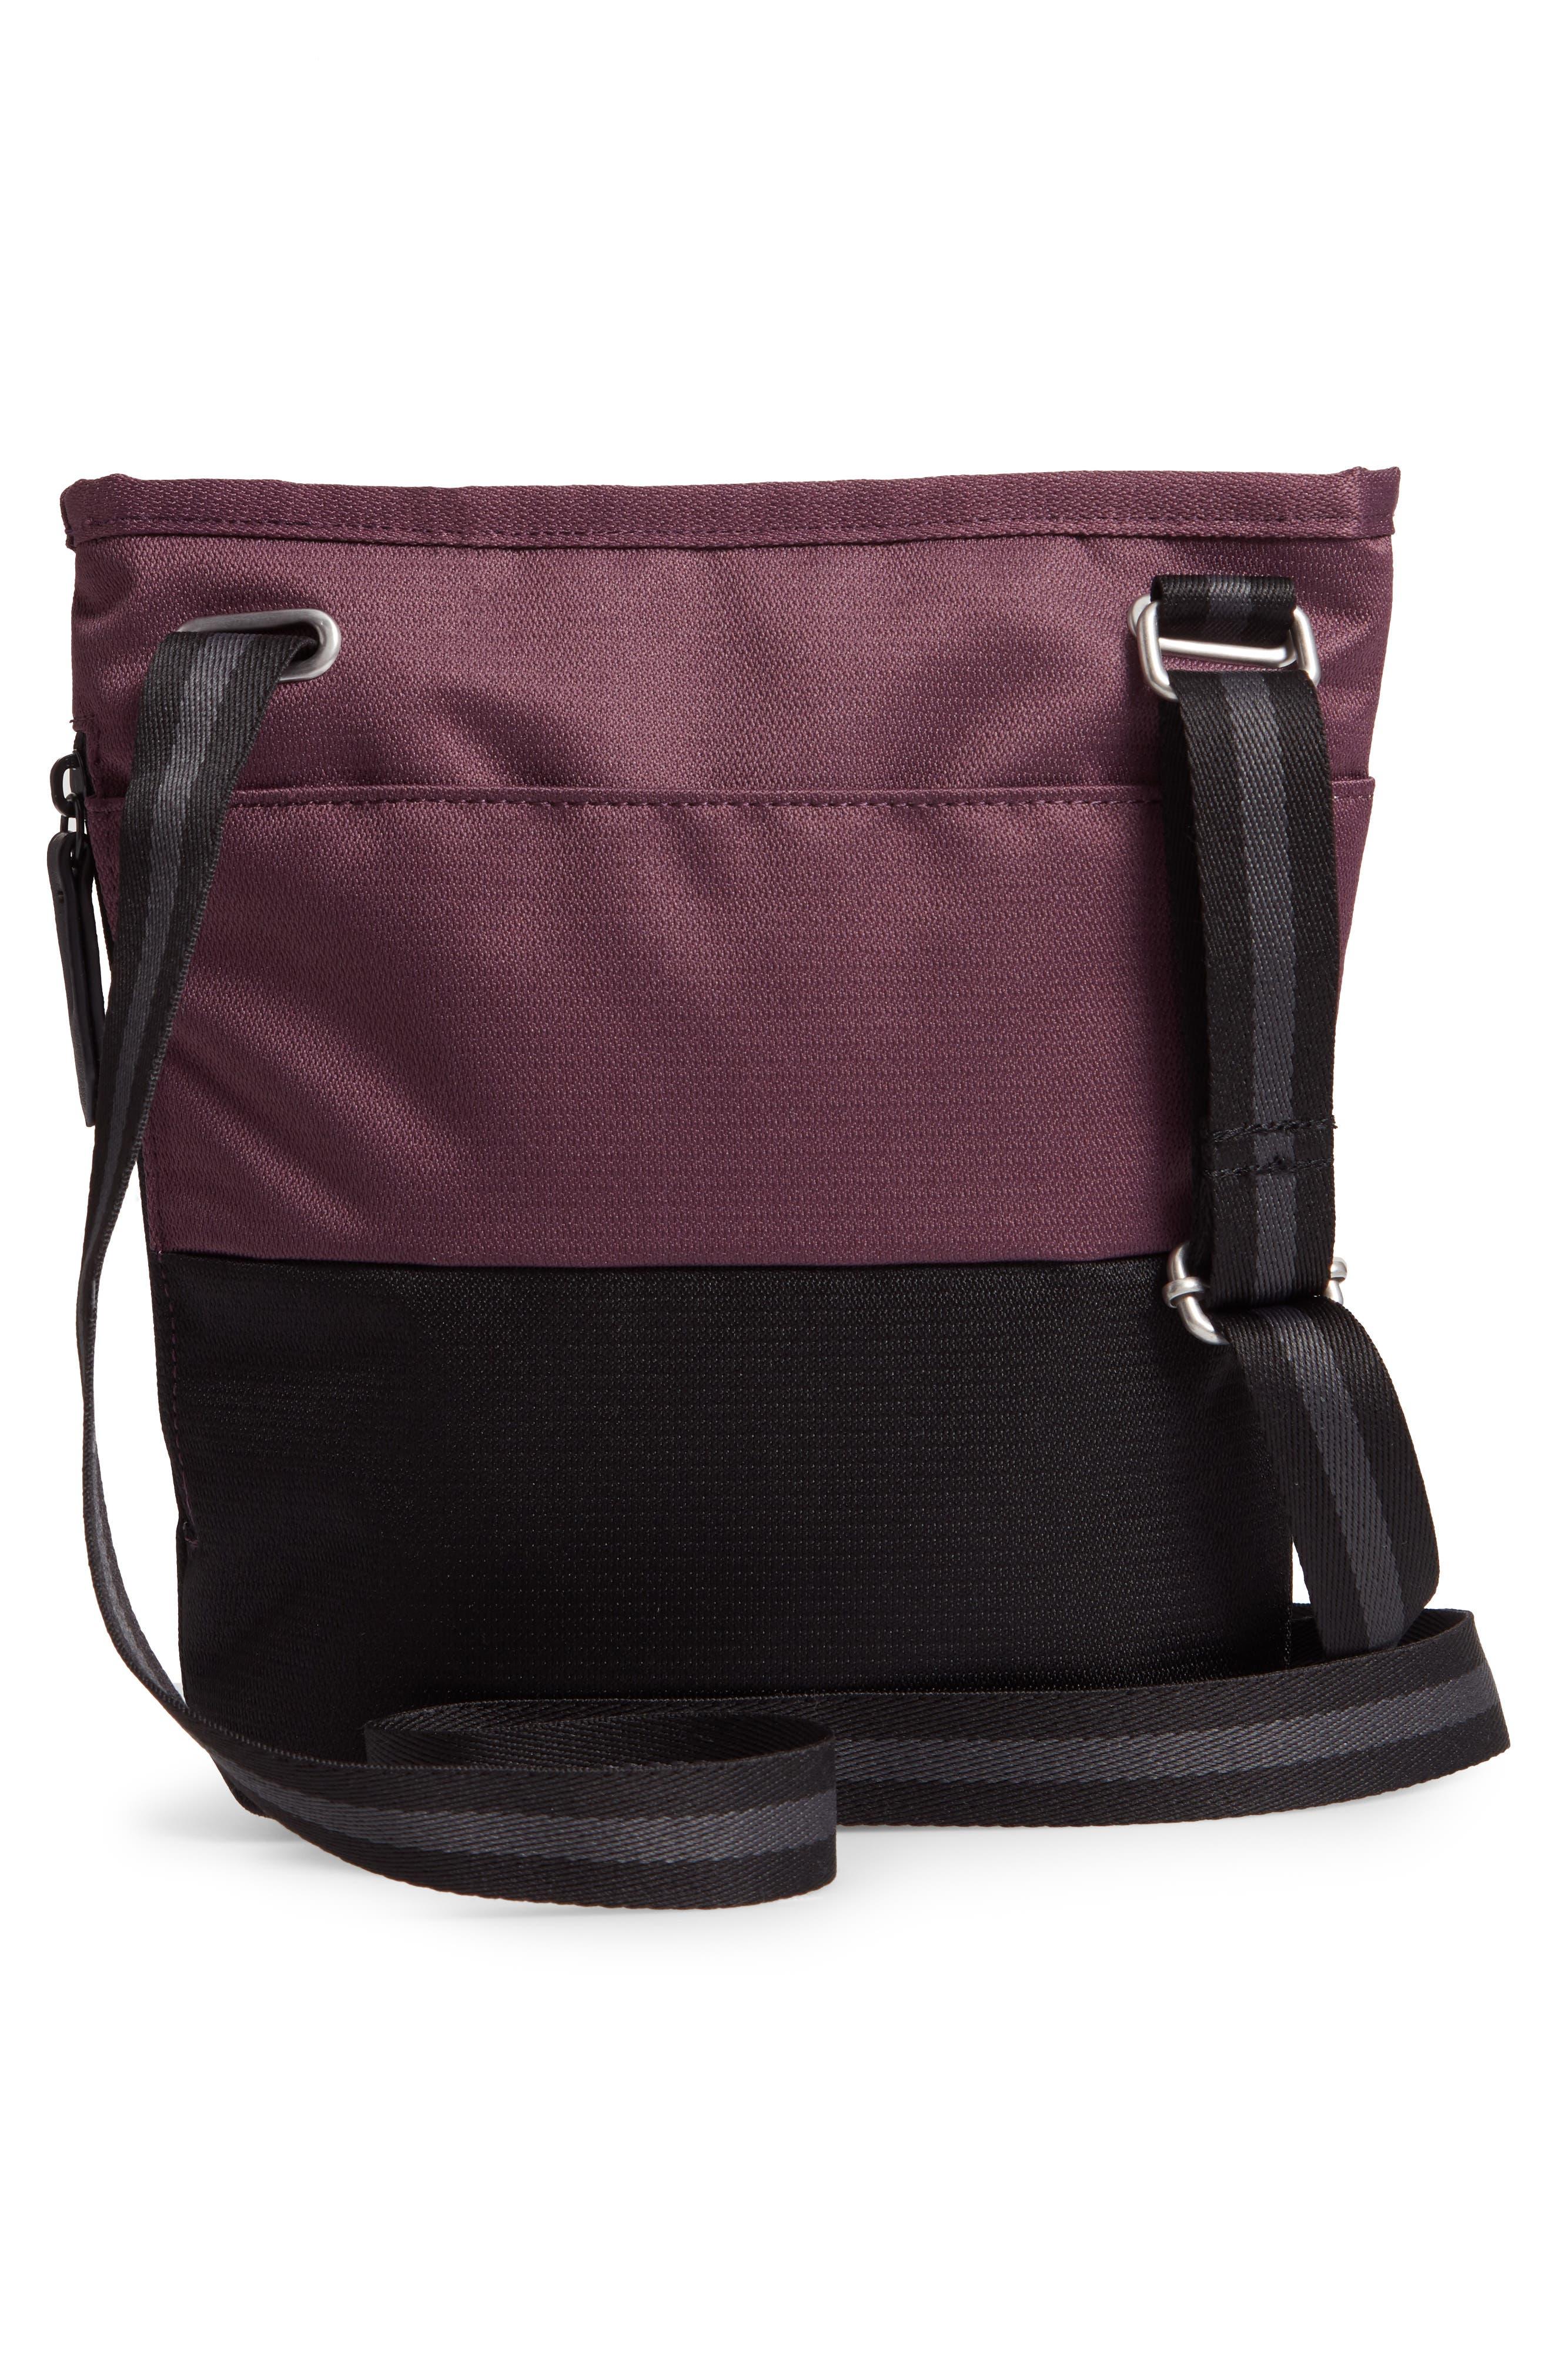 Sadie Medium RFID Crossbody Bag,                             Alternate thumbnail 3, color,                             PURPLE DAHLIA/ BLACK